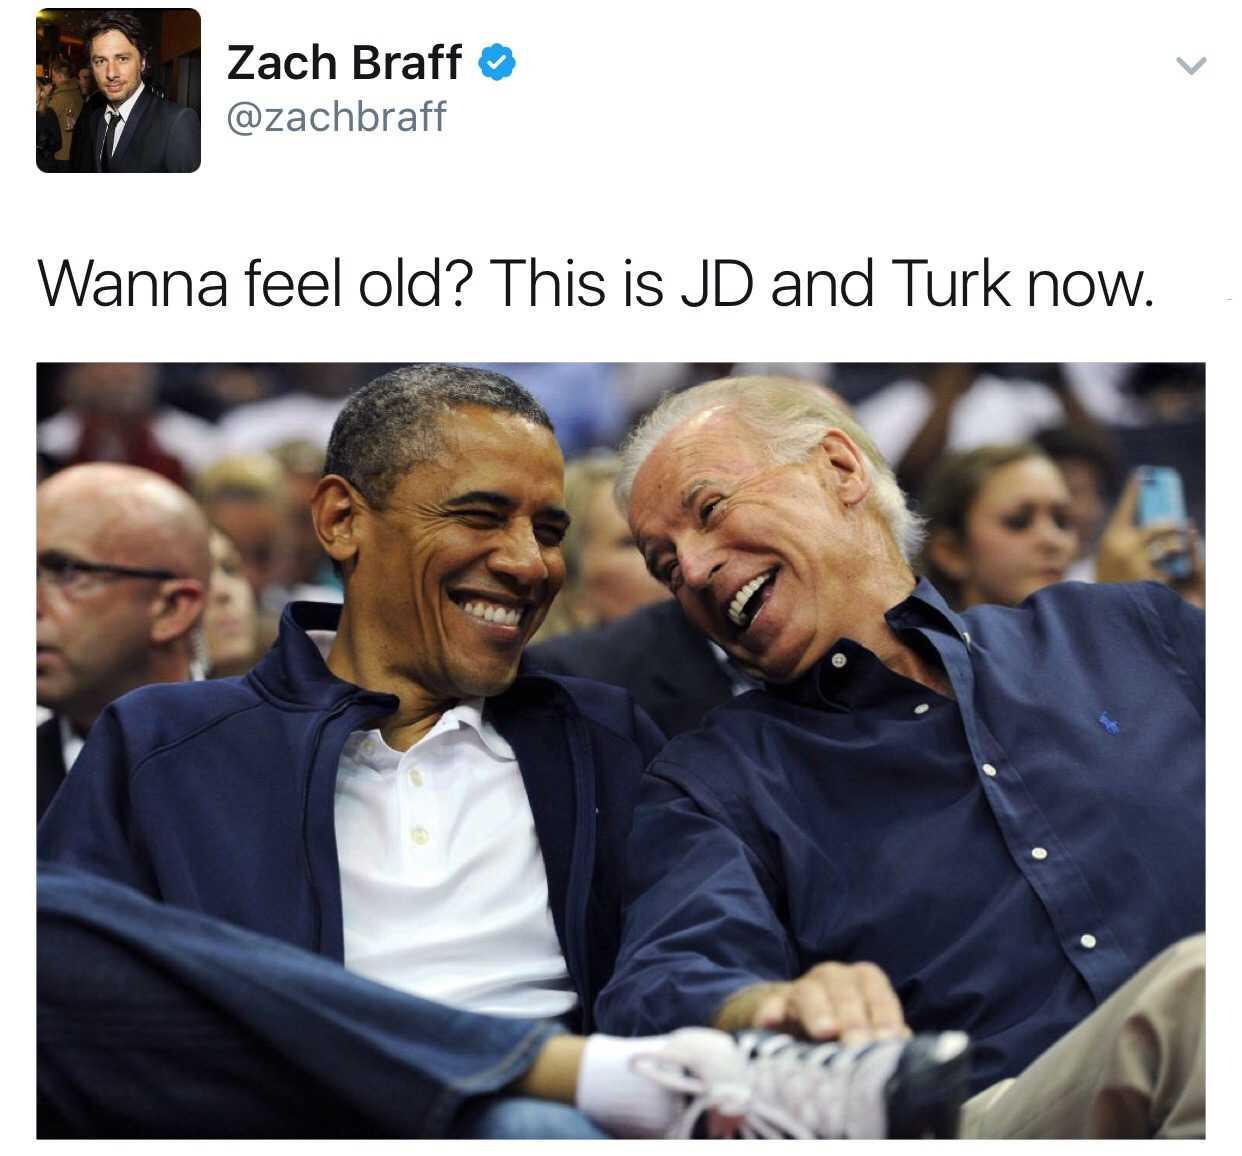 Obama and Biden Memes - jd and turk